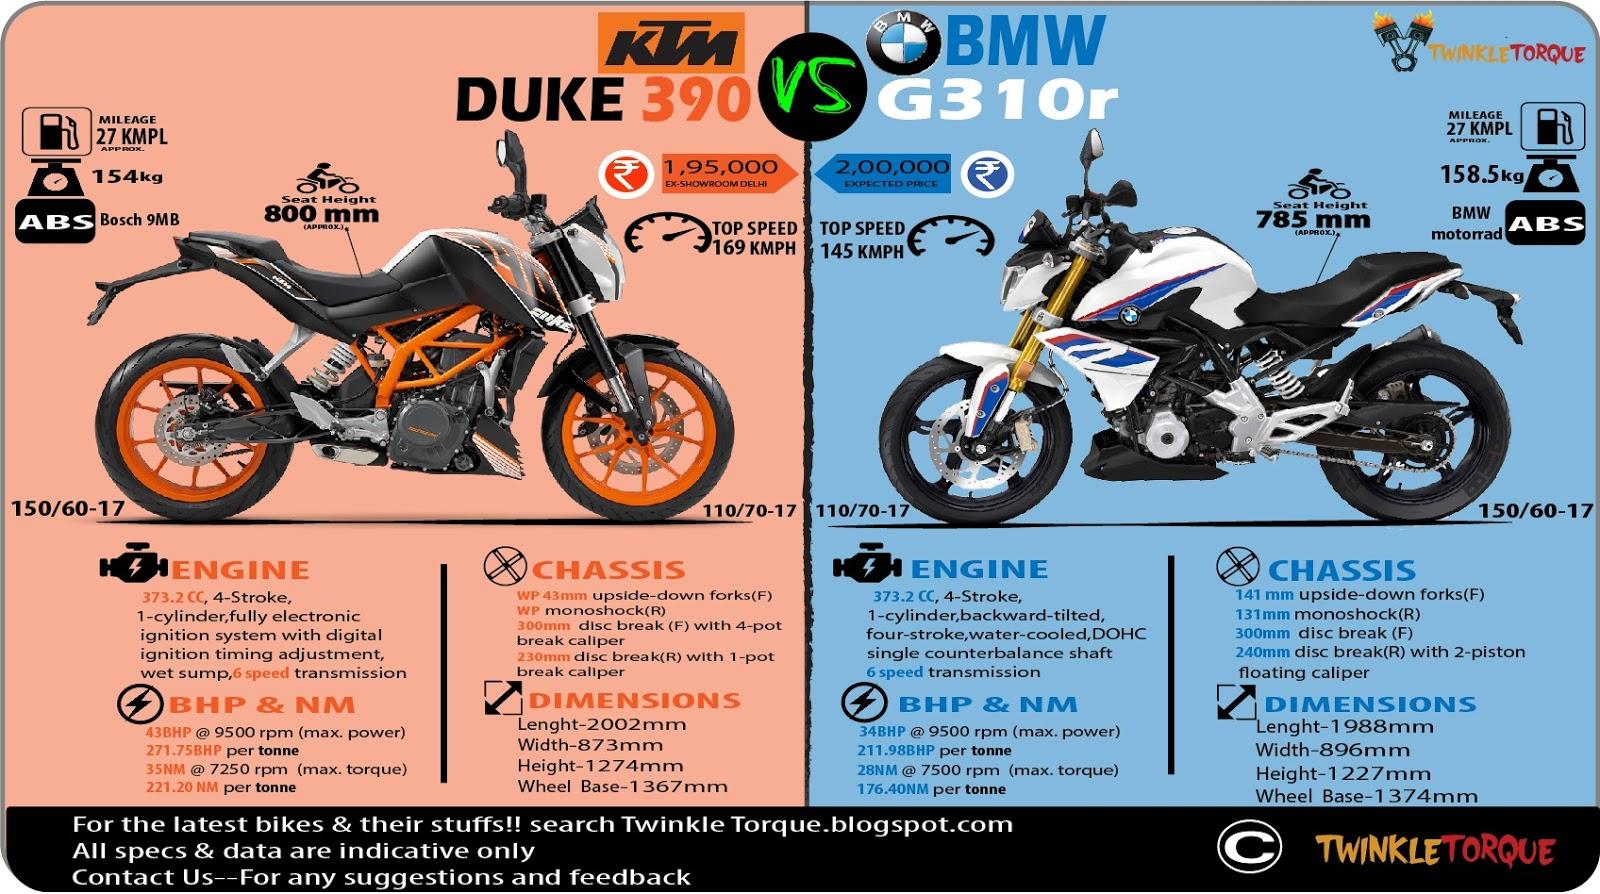 KTM DUKE 390 & BMW G310R twinkle torque